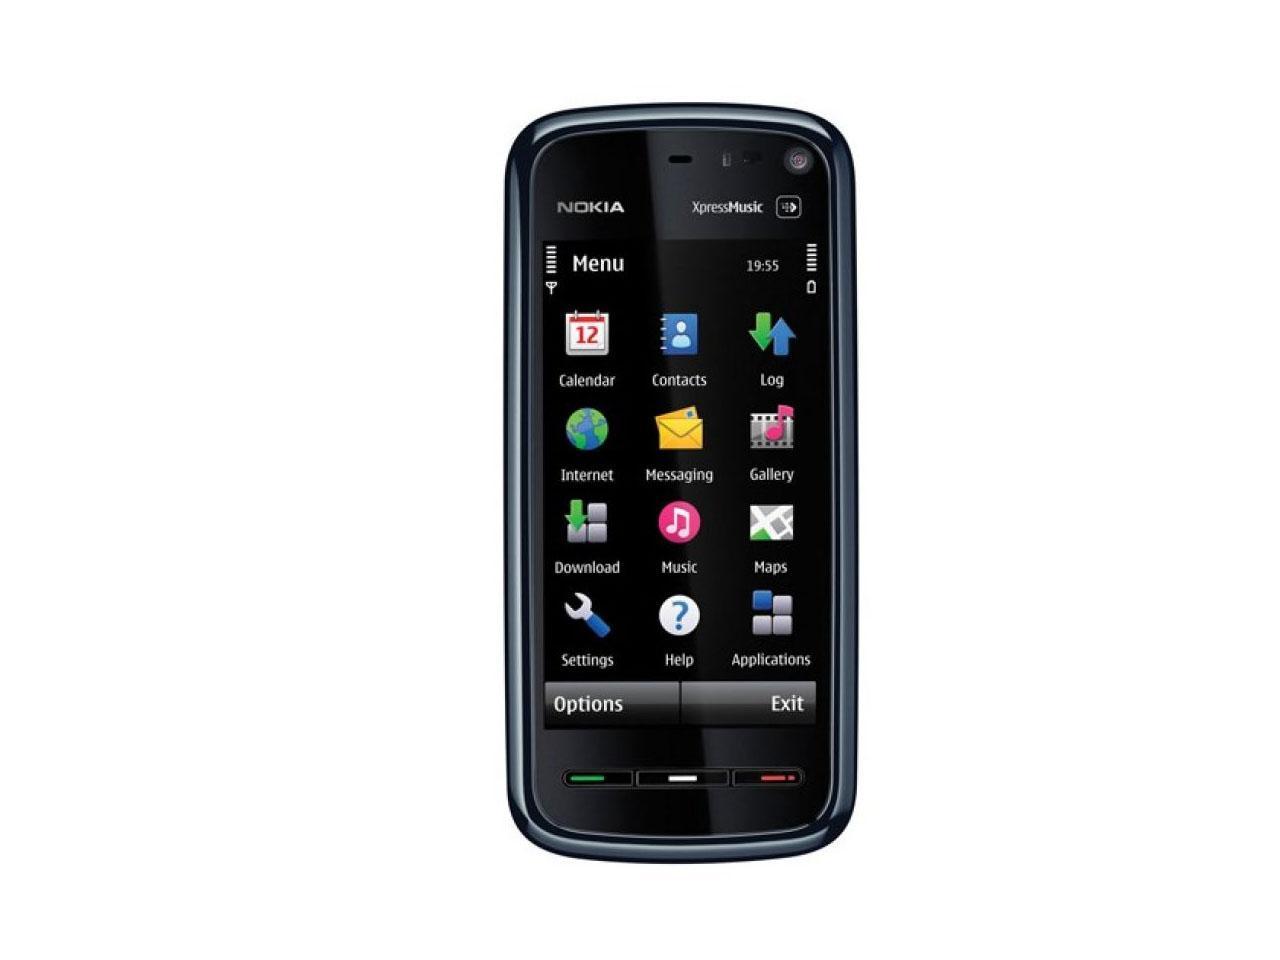 Nokia 5800 XpressMusic обои 1280x960.